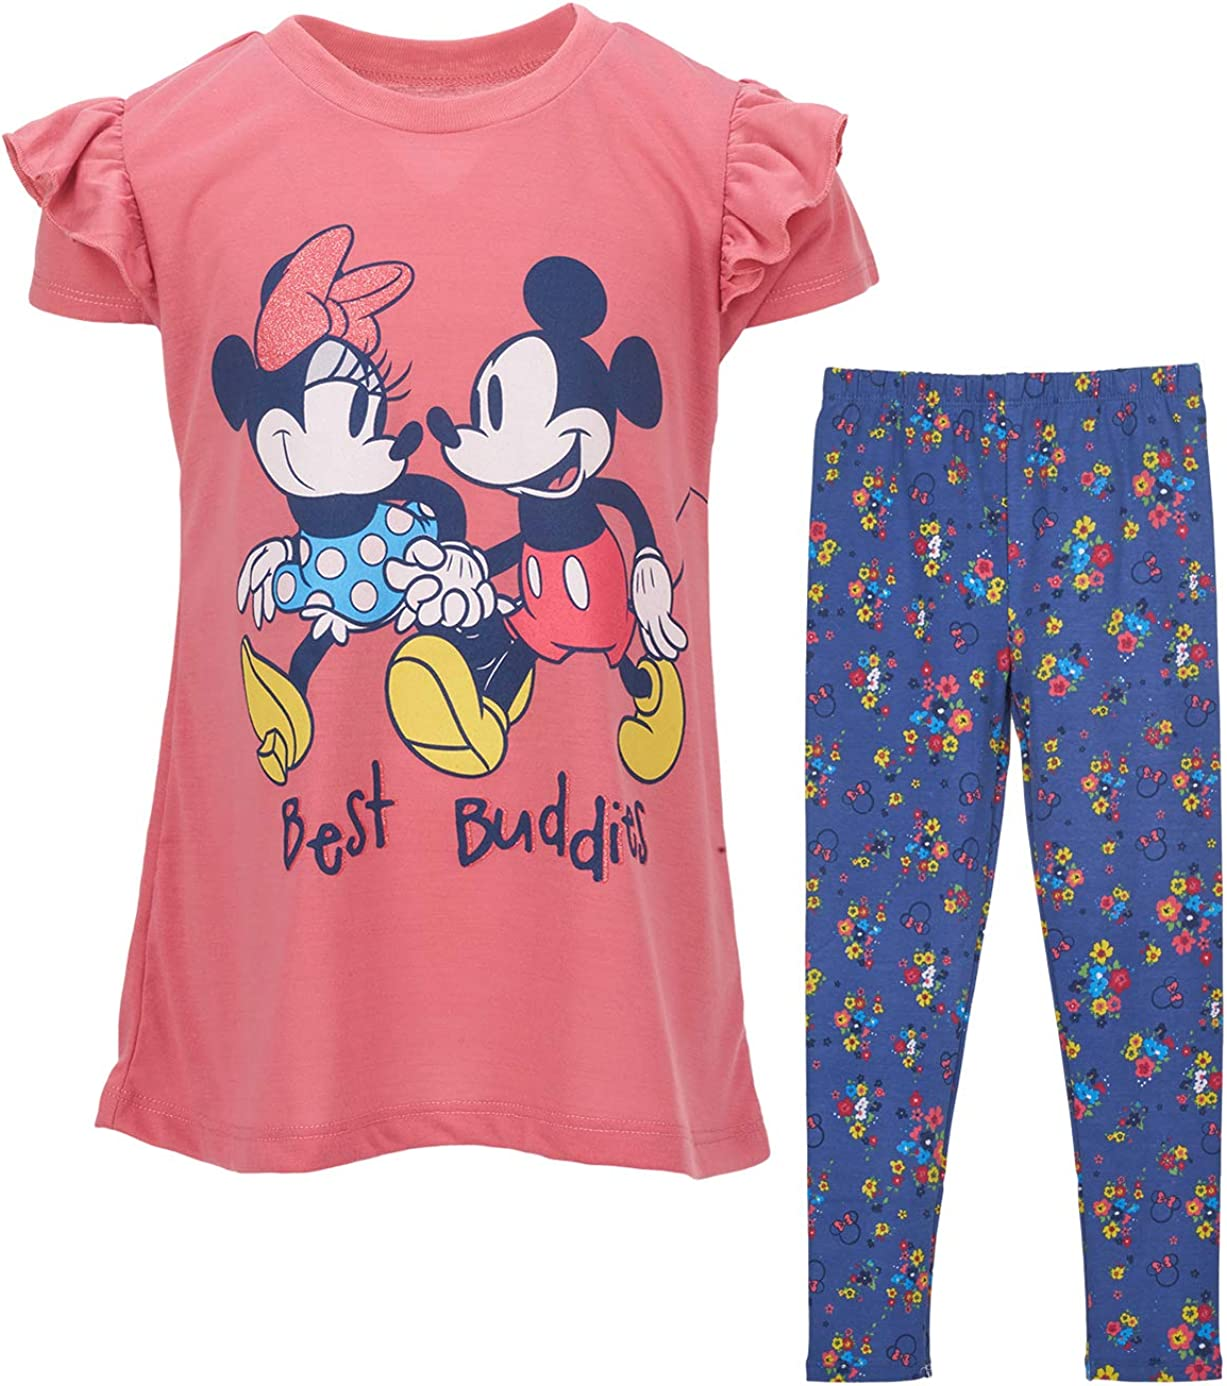 Disney Minnie Mouse Toddler Girls Short Sleeve Tunic Shirt /& Legging Set